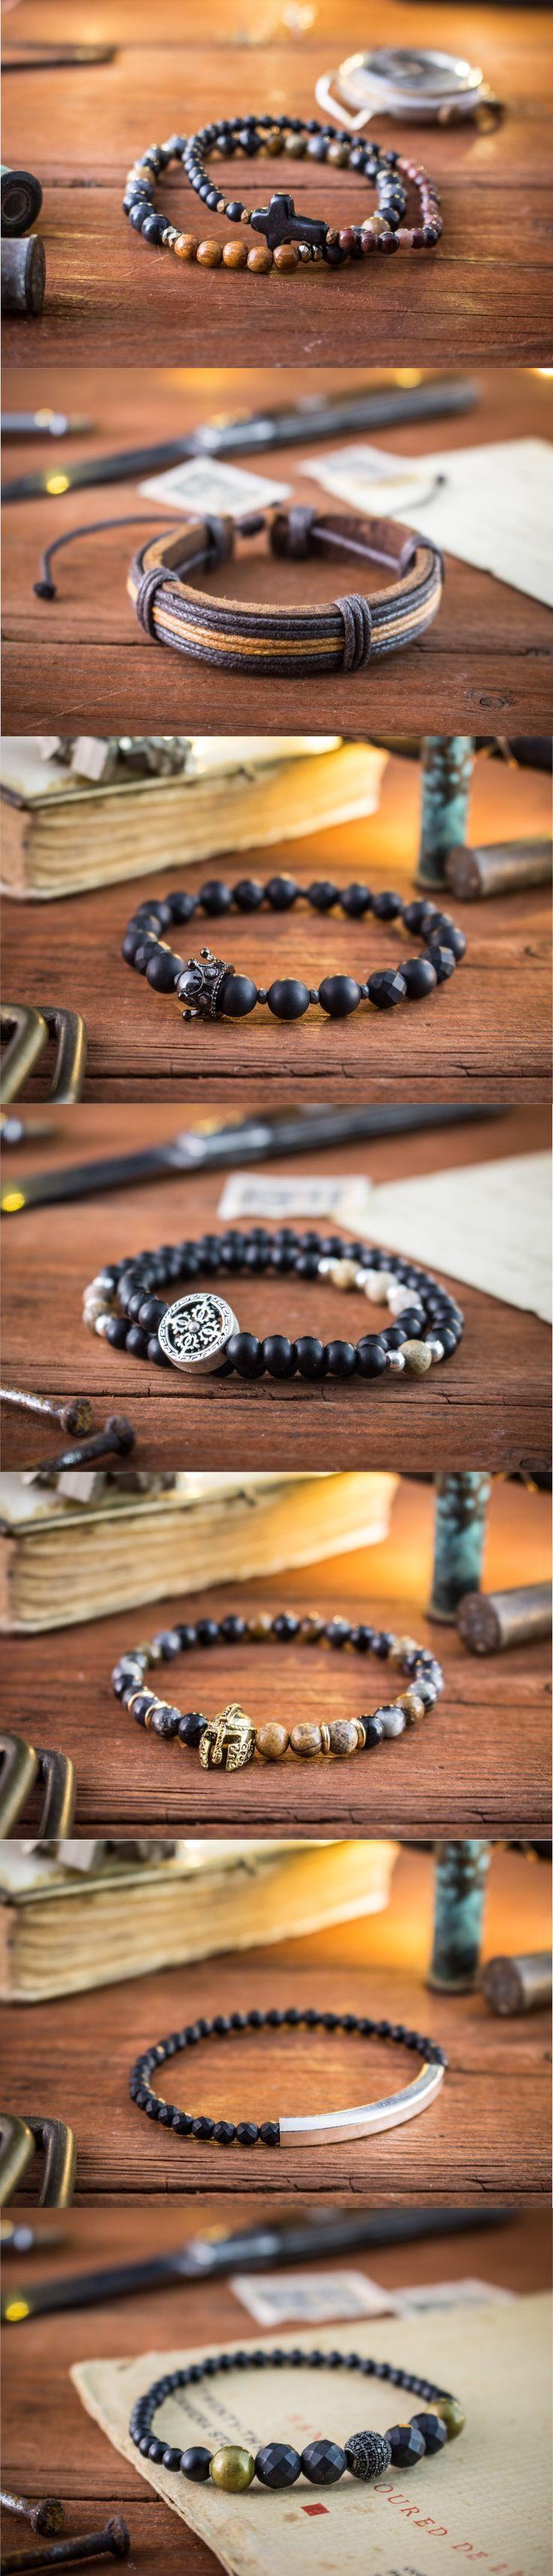 Selection of bracelets for men